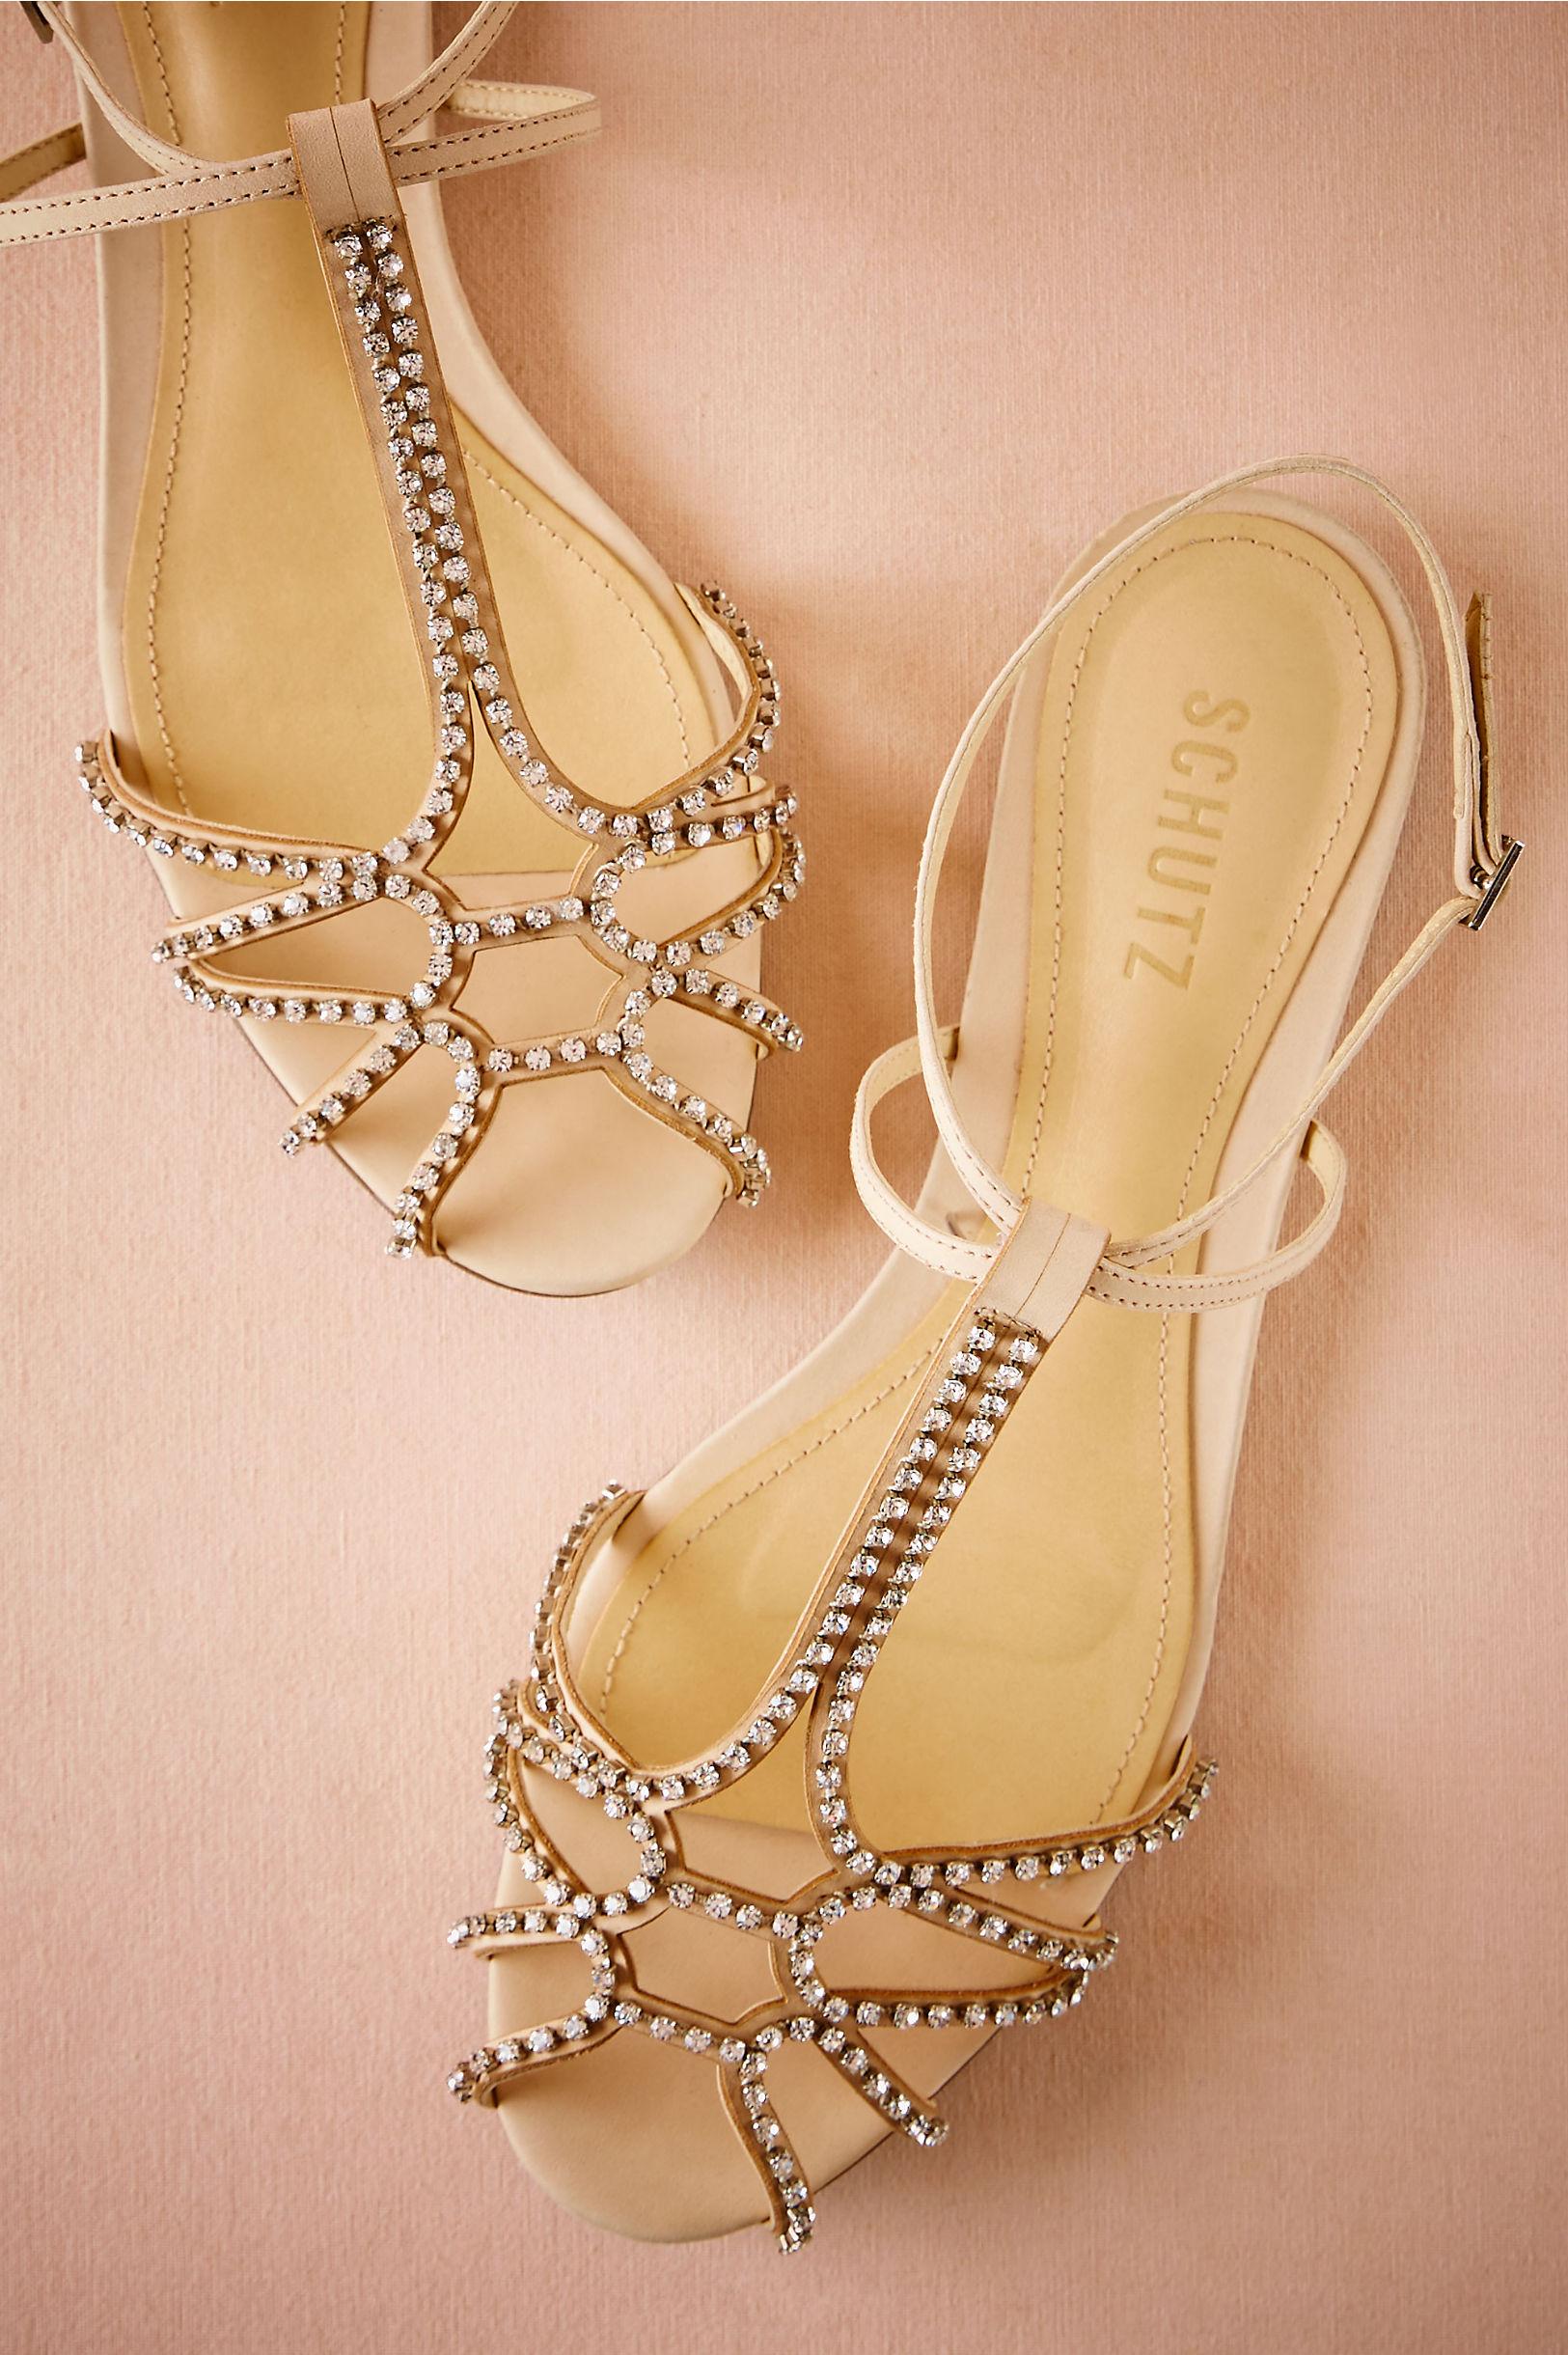 Sandals honeymoon shoes with rhinestone - Nude Dorothea Sandals Bhldn